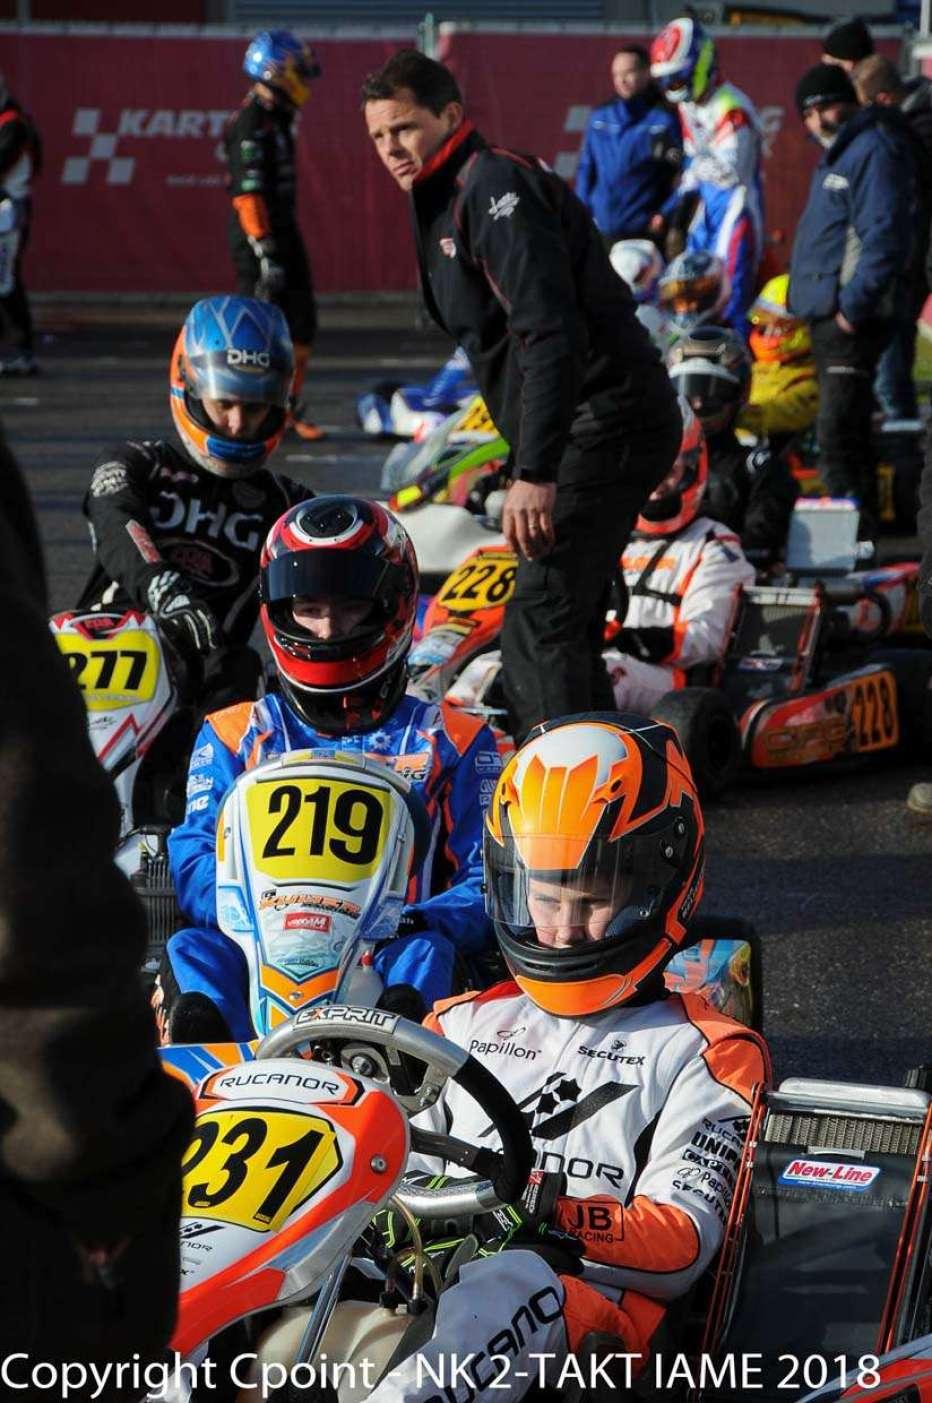 nk_2-takt_iame_2018_race_1_genk-31.0x1240.jpg